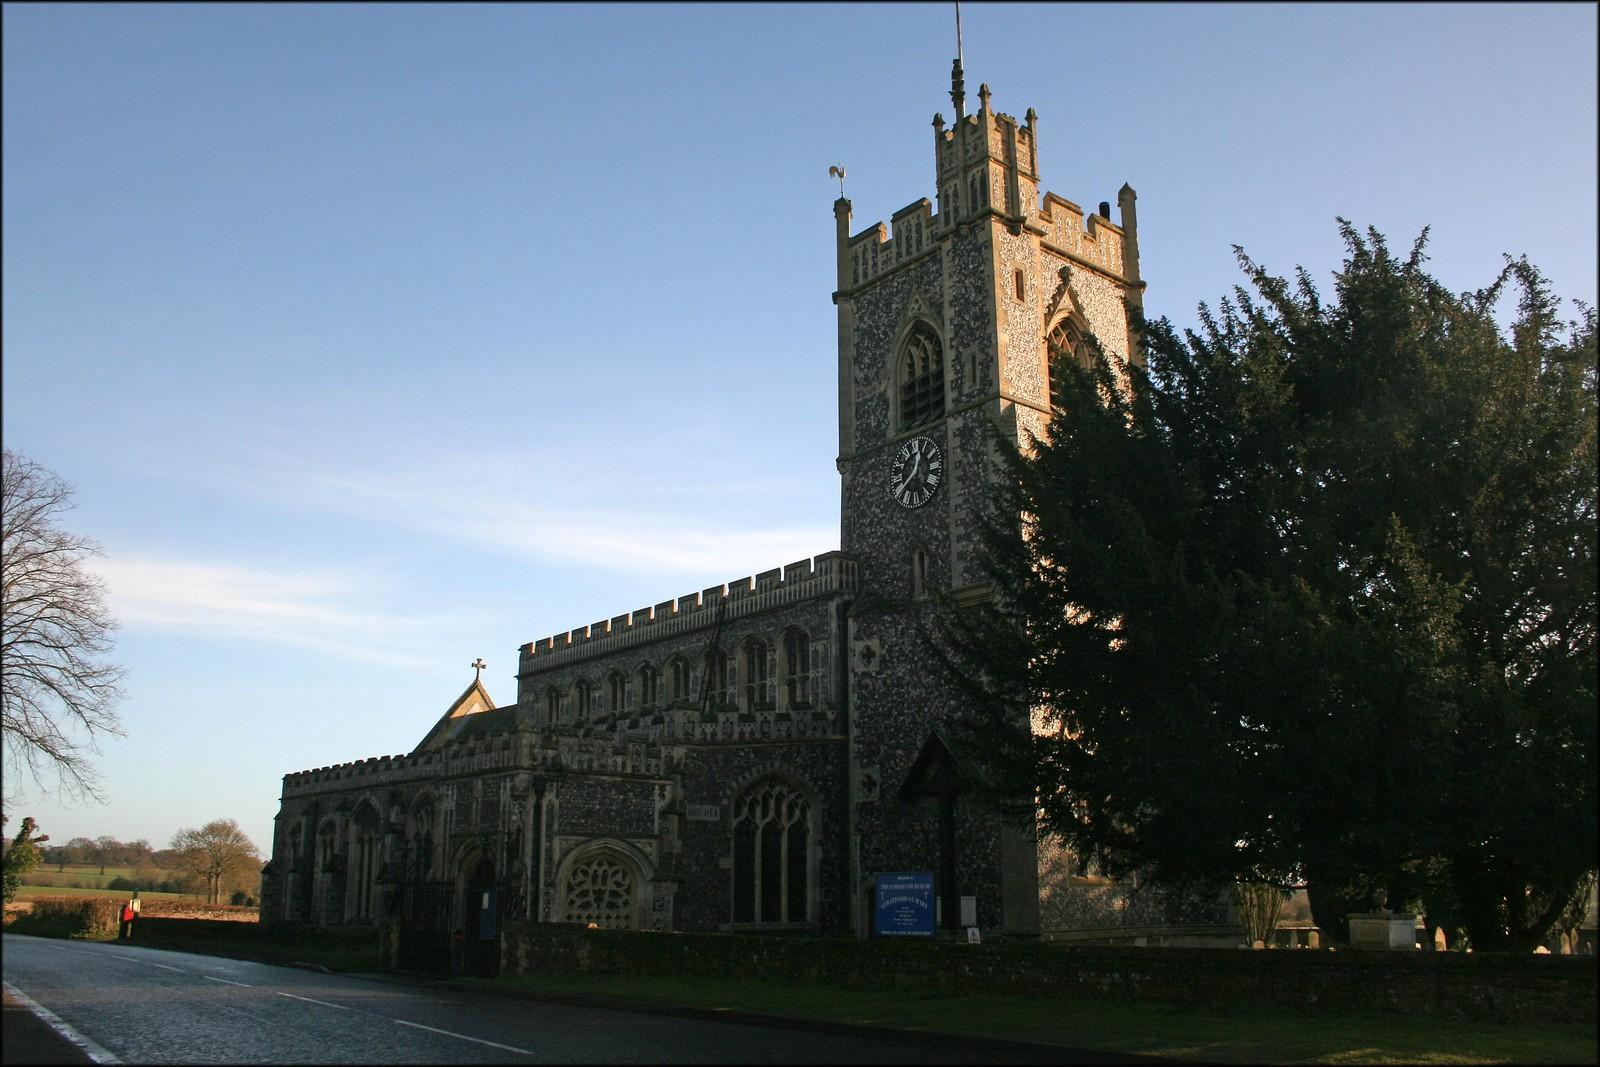 Straford St Mary church